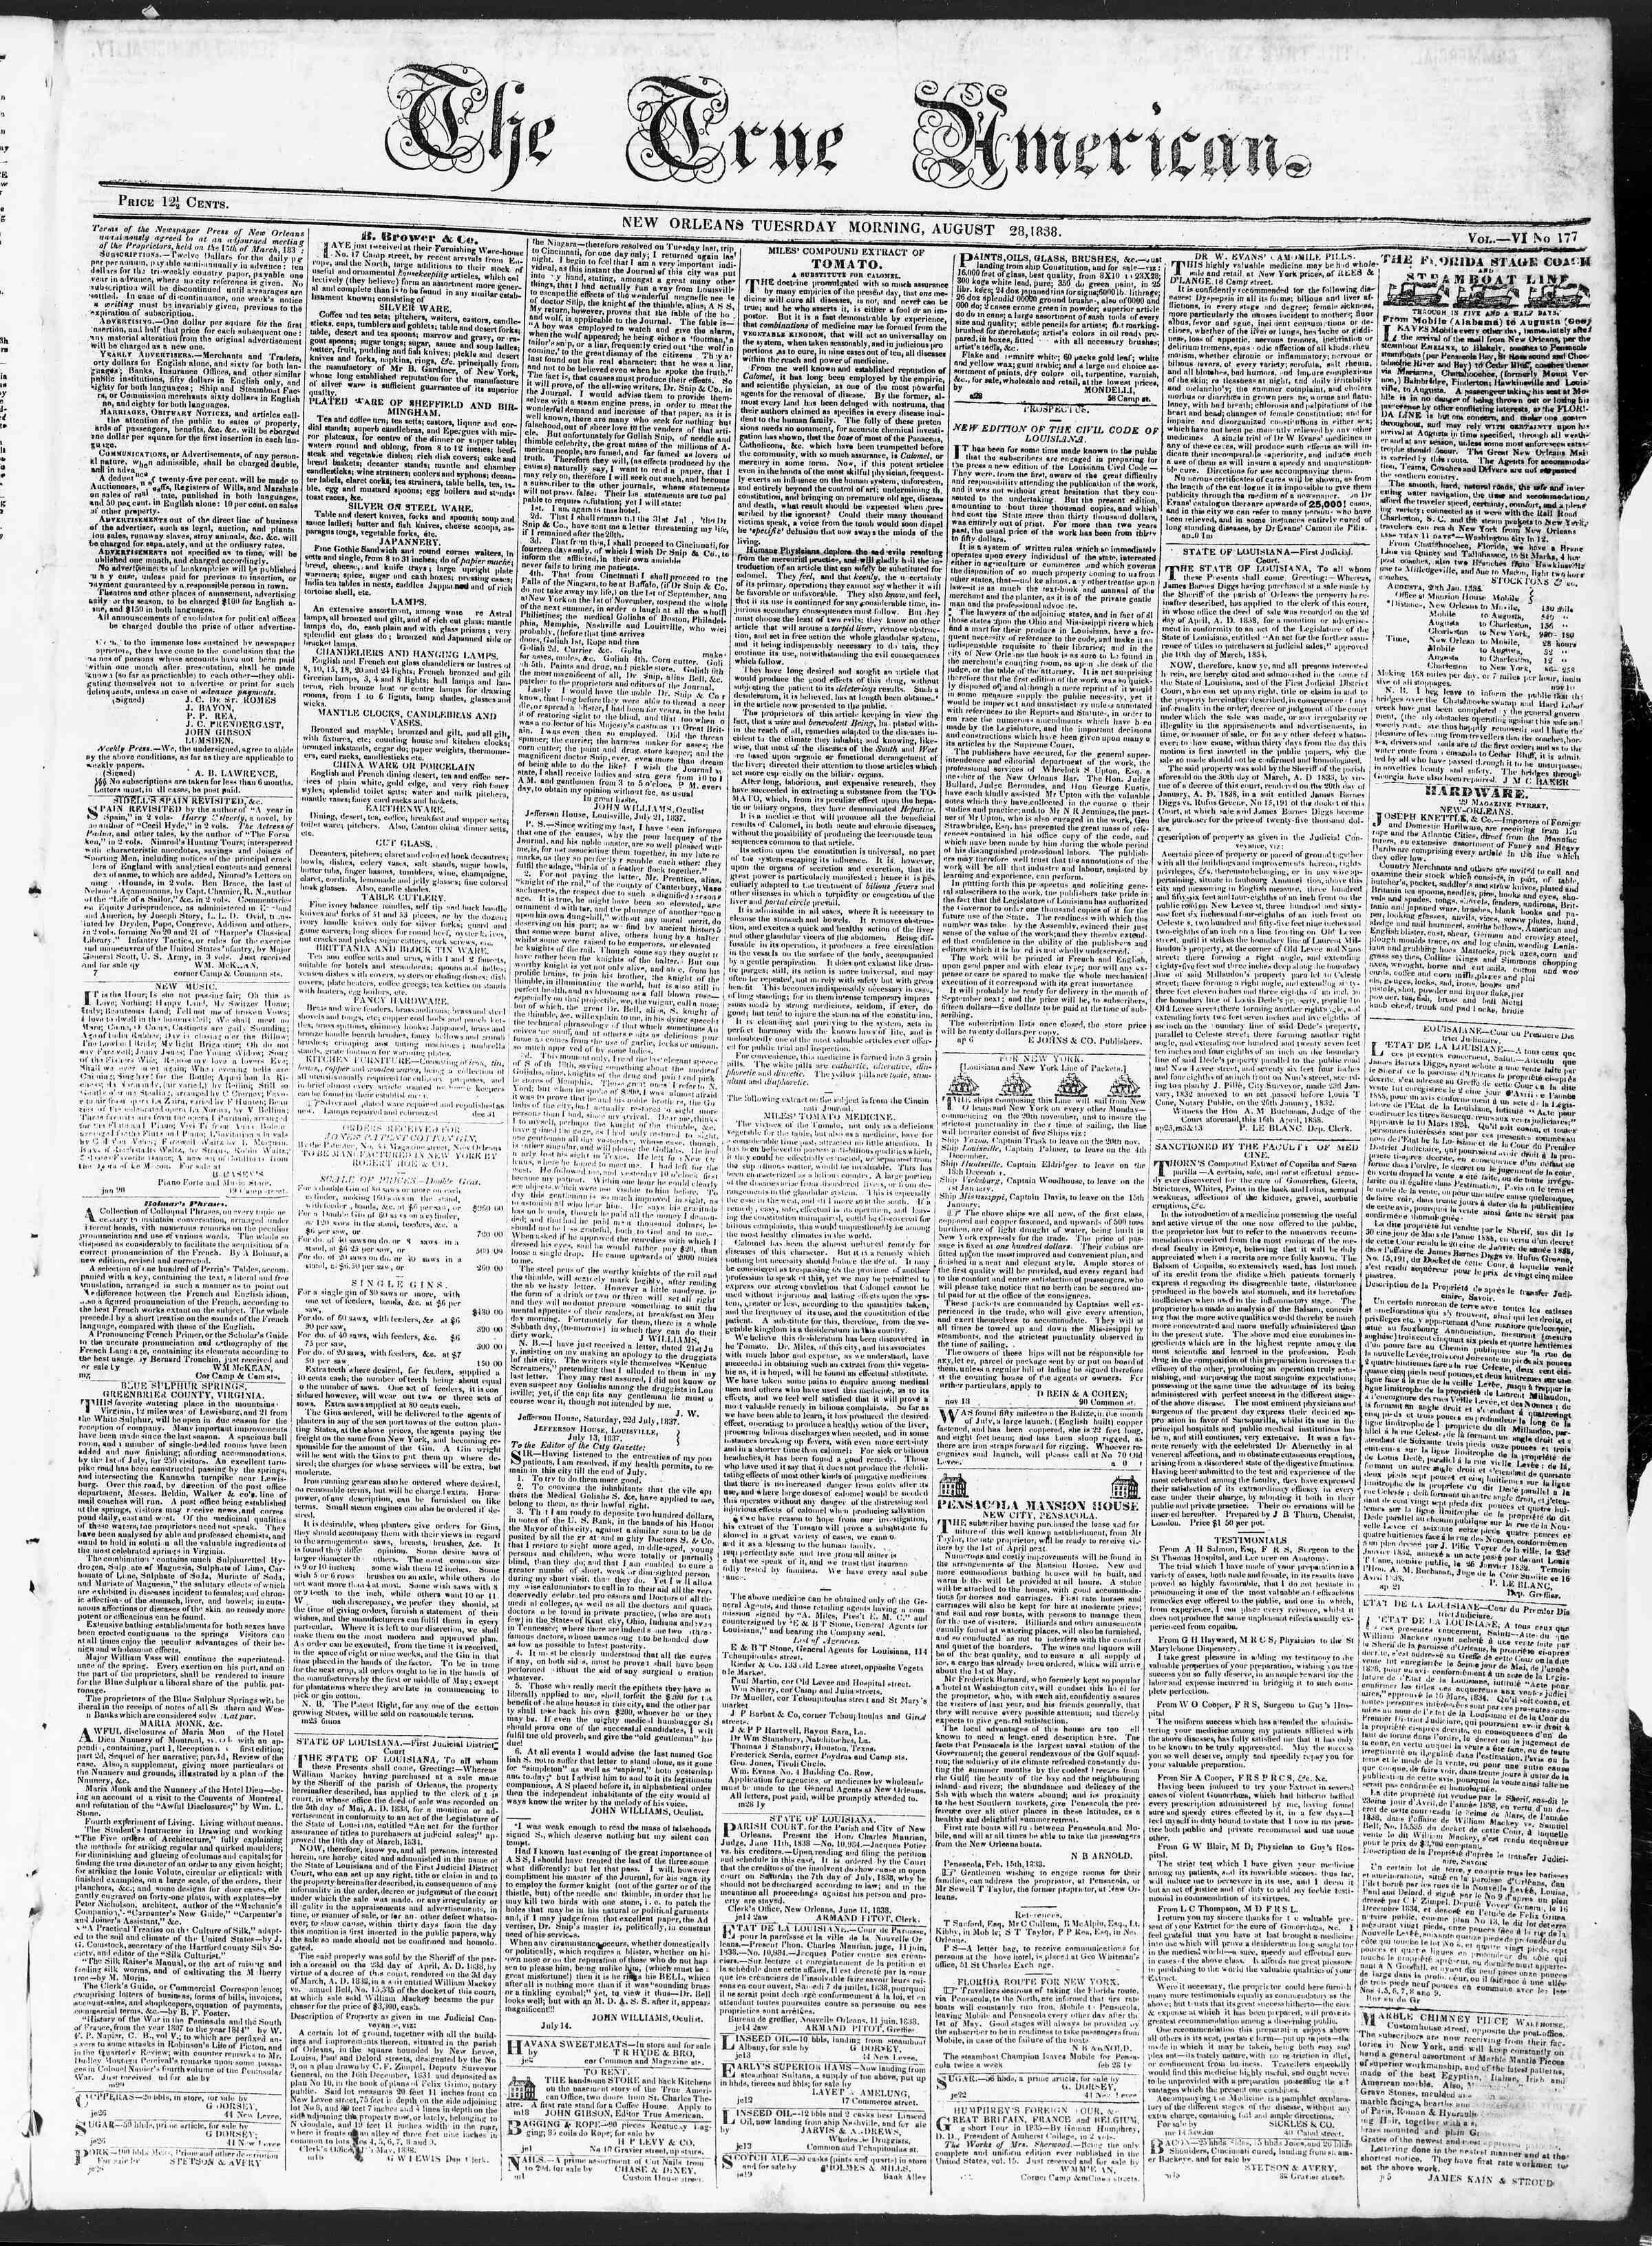 August 28, 1838 Tarihli True American Gazetesi Sayfa 1